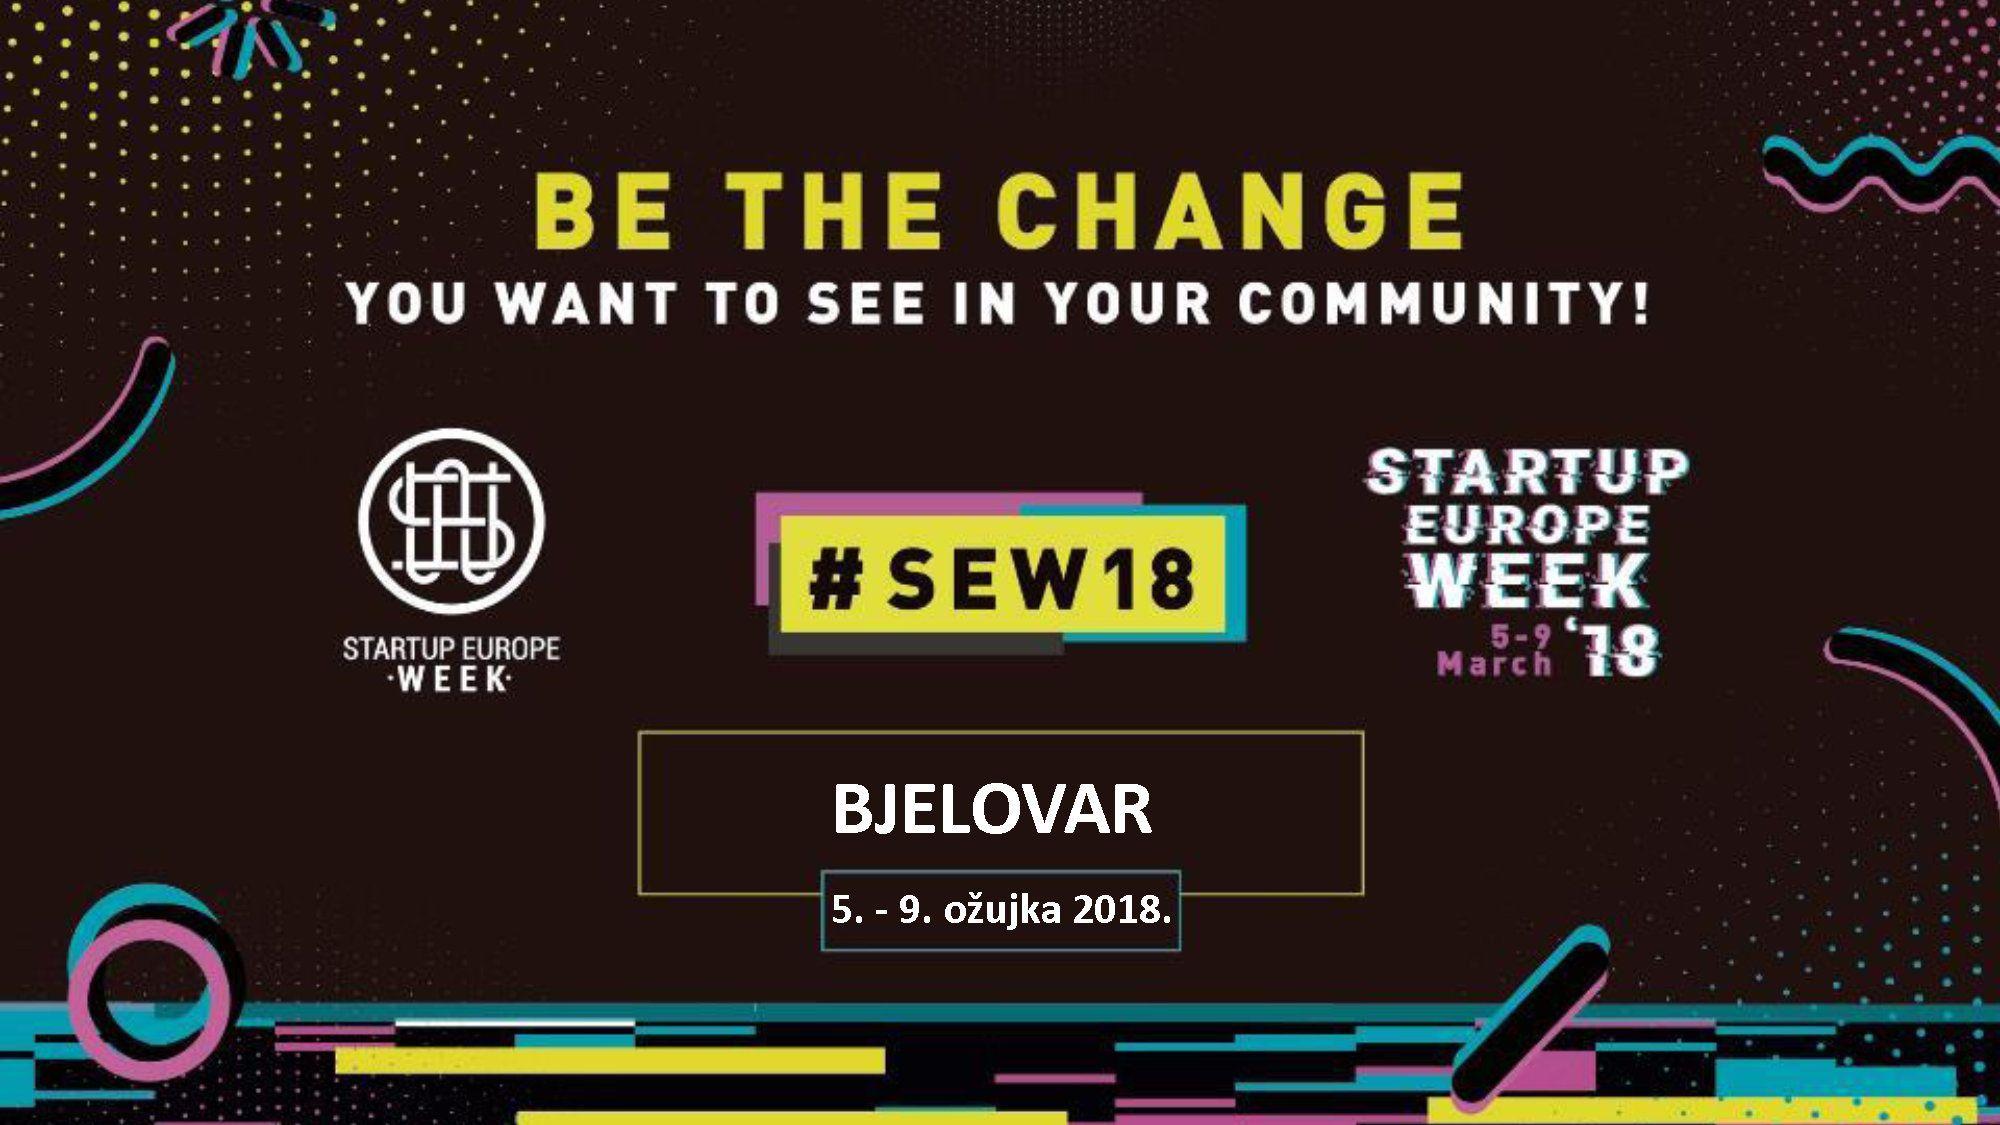 GRAD BJELOVAR - otvorenje Startup Europe weeka 2018.